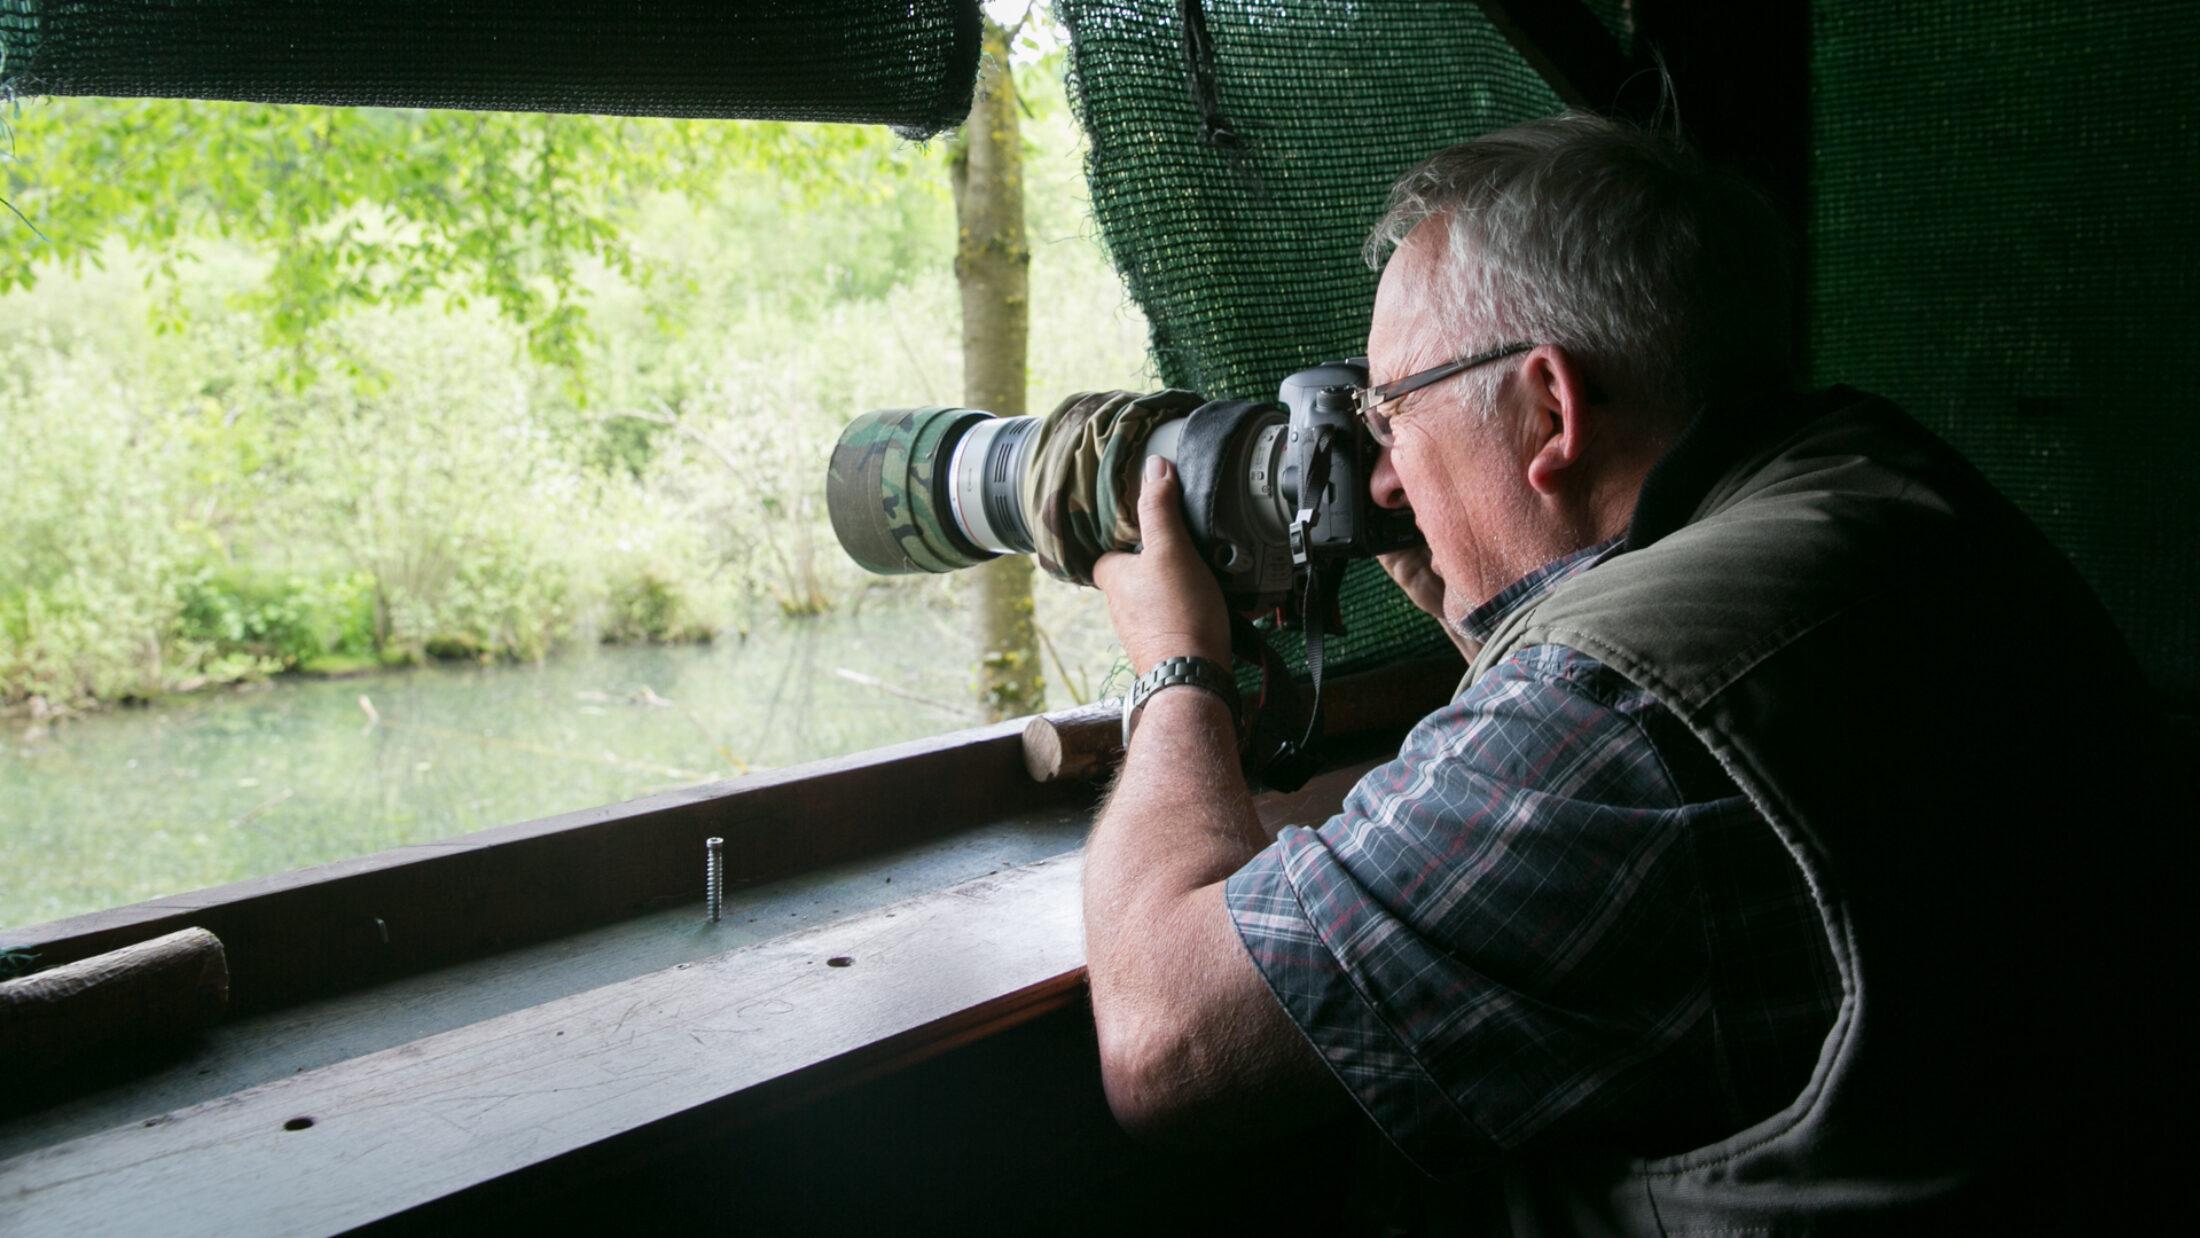 Wildlife watching in the Charleroi metropolitan area